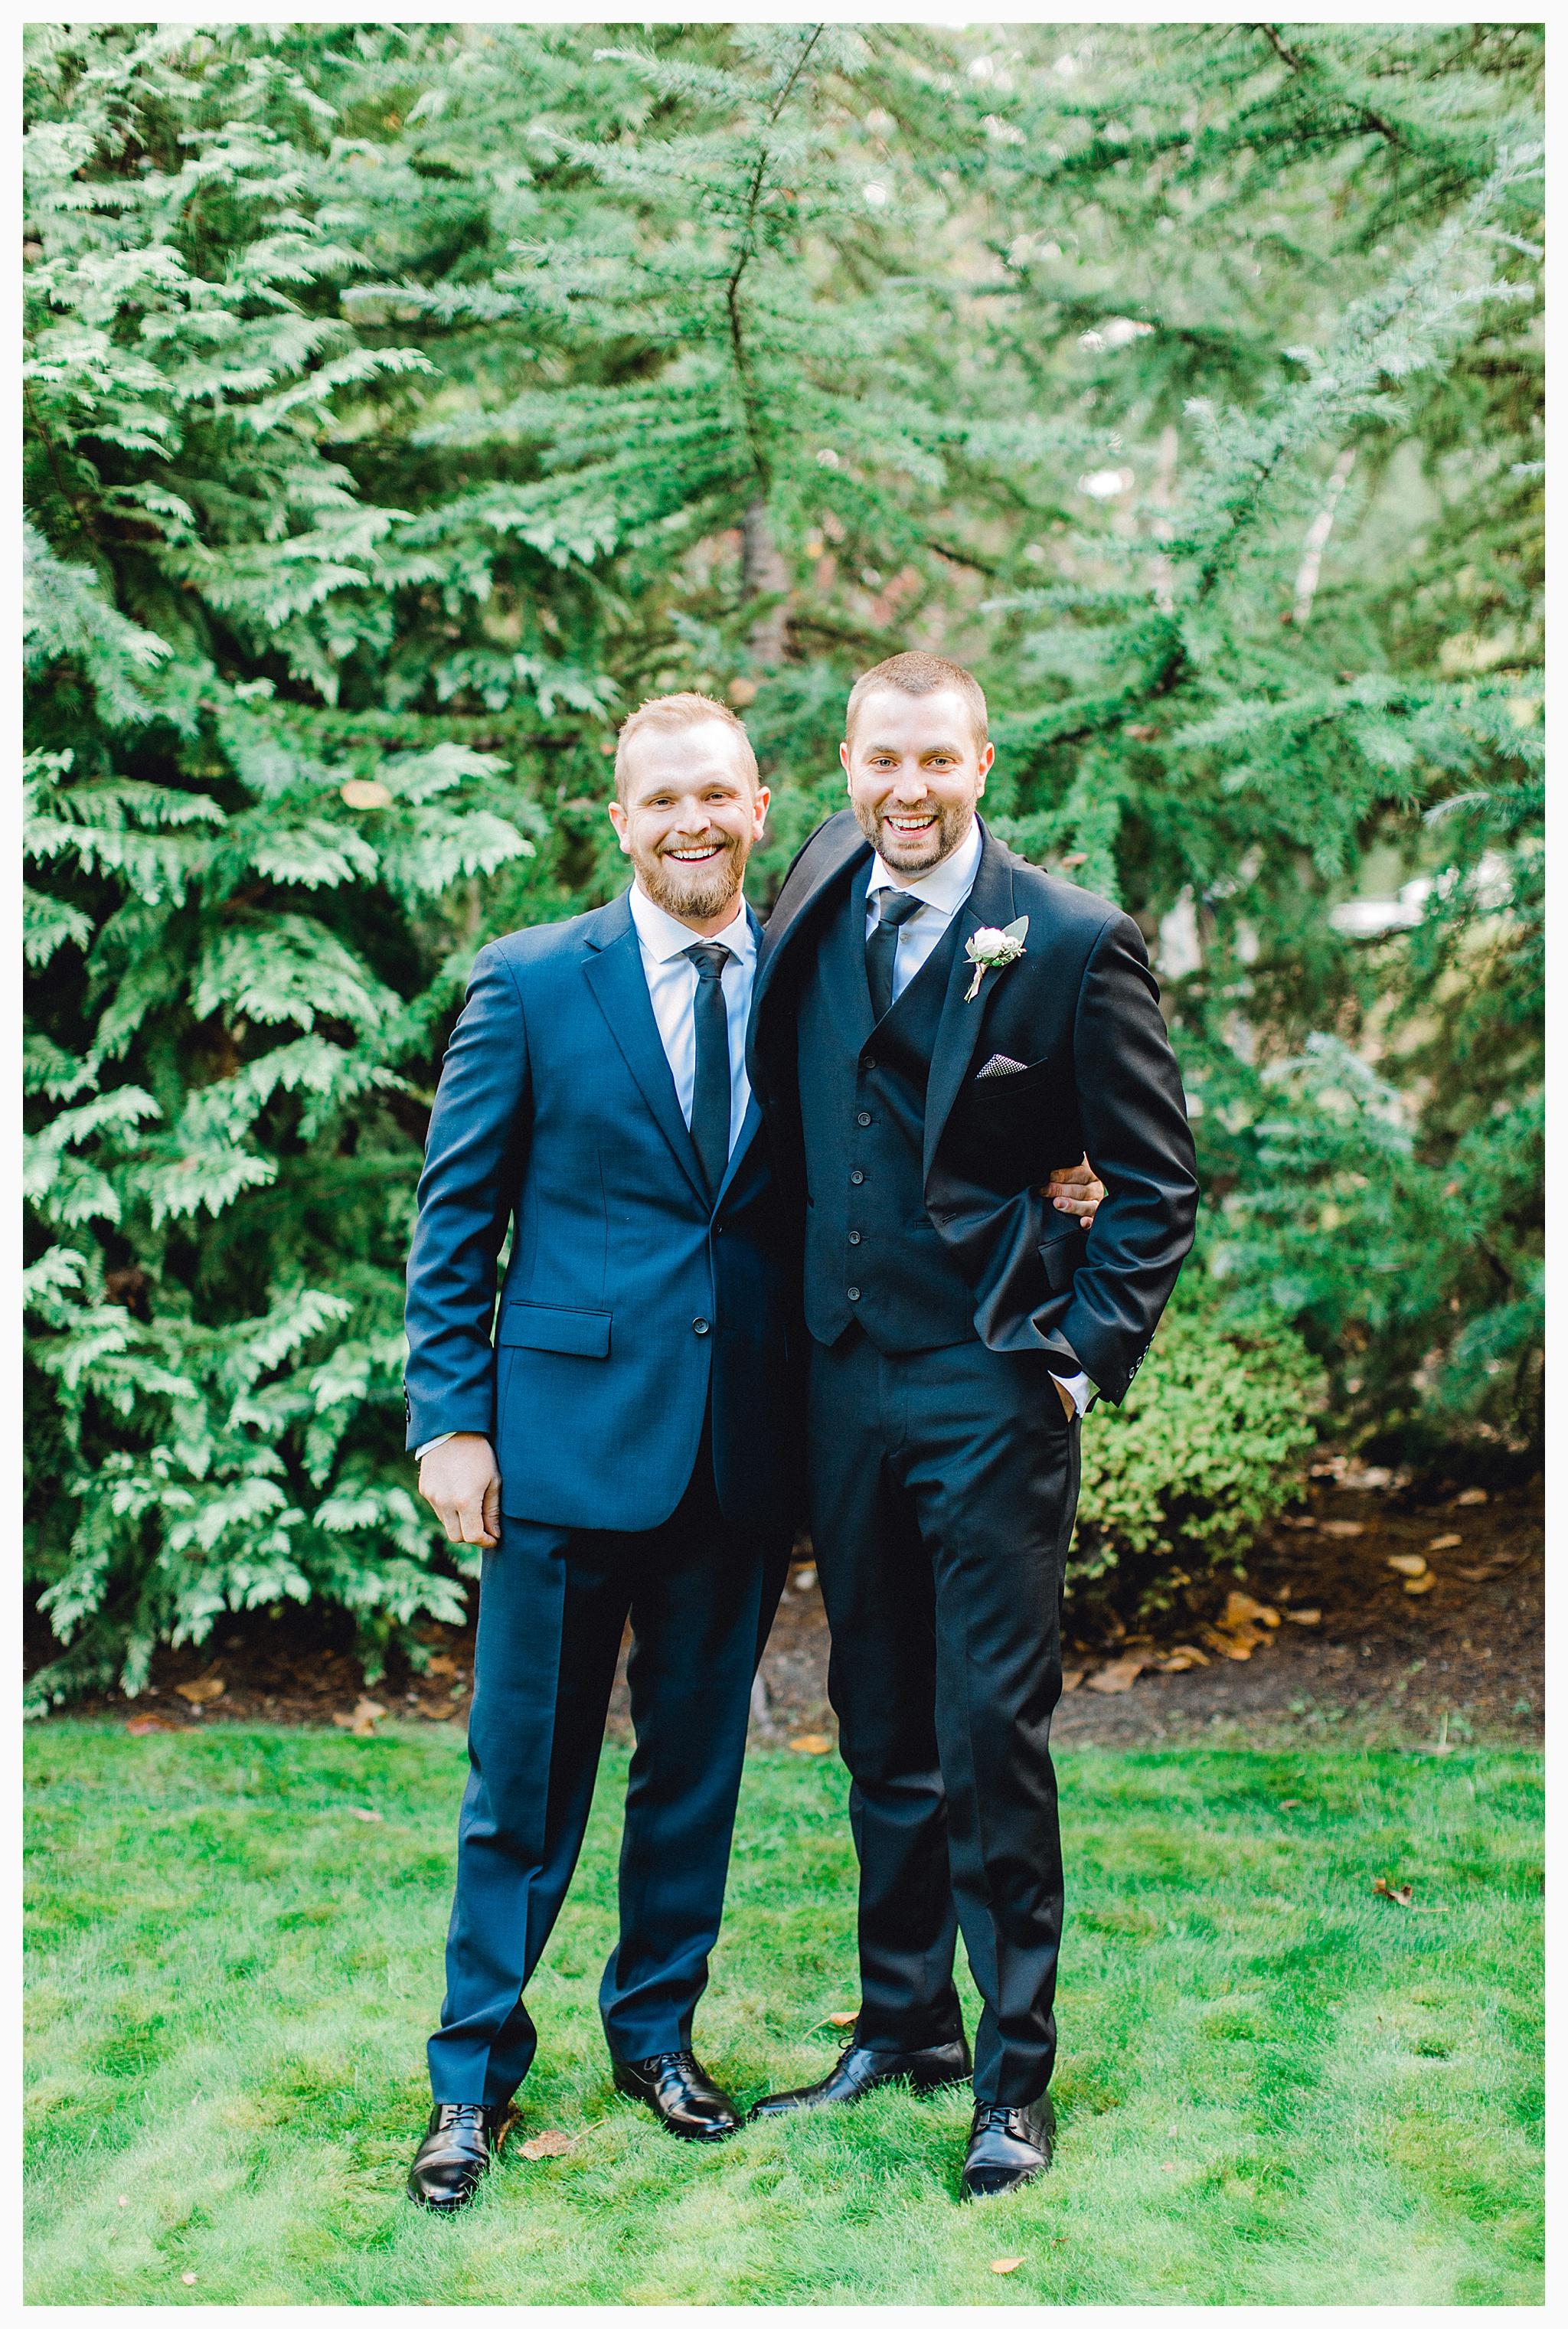 Emma Rose Company Light and Airy Wedding Photographer, Beautiful fall wedding at Rock Creek Gardens Venue in Puyallup, Washington._0047.jpg